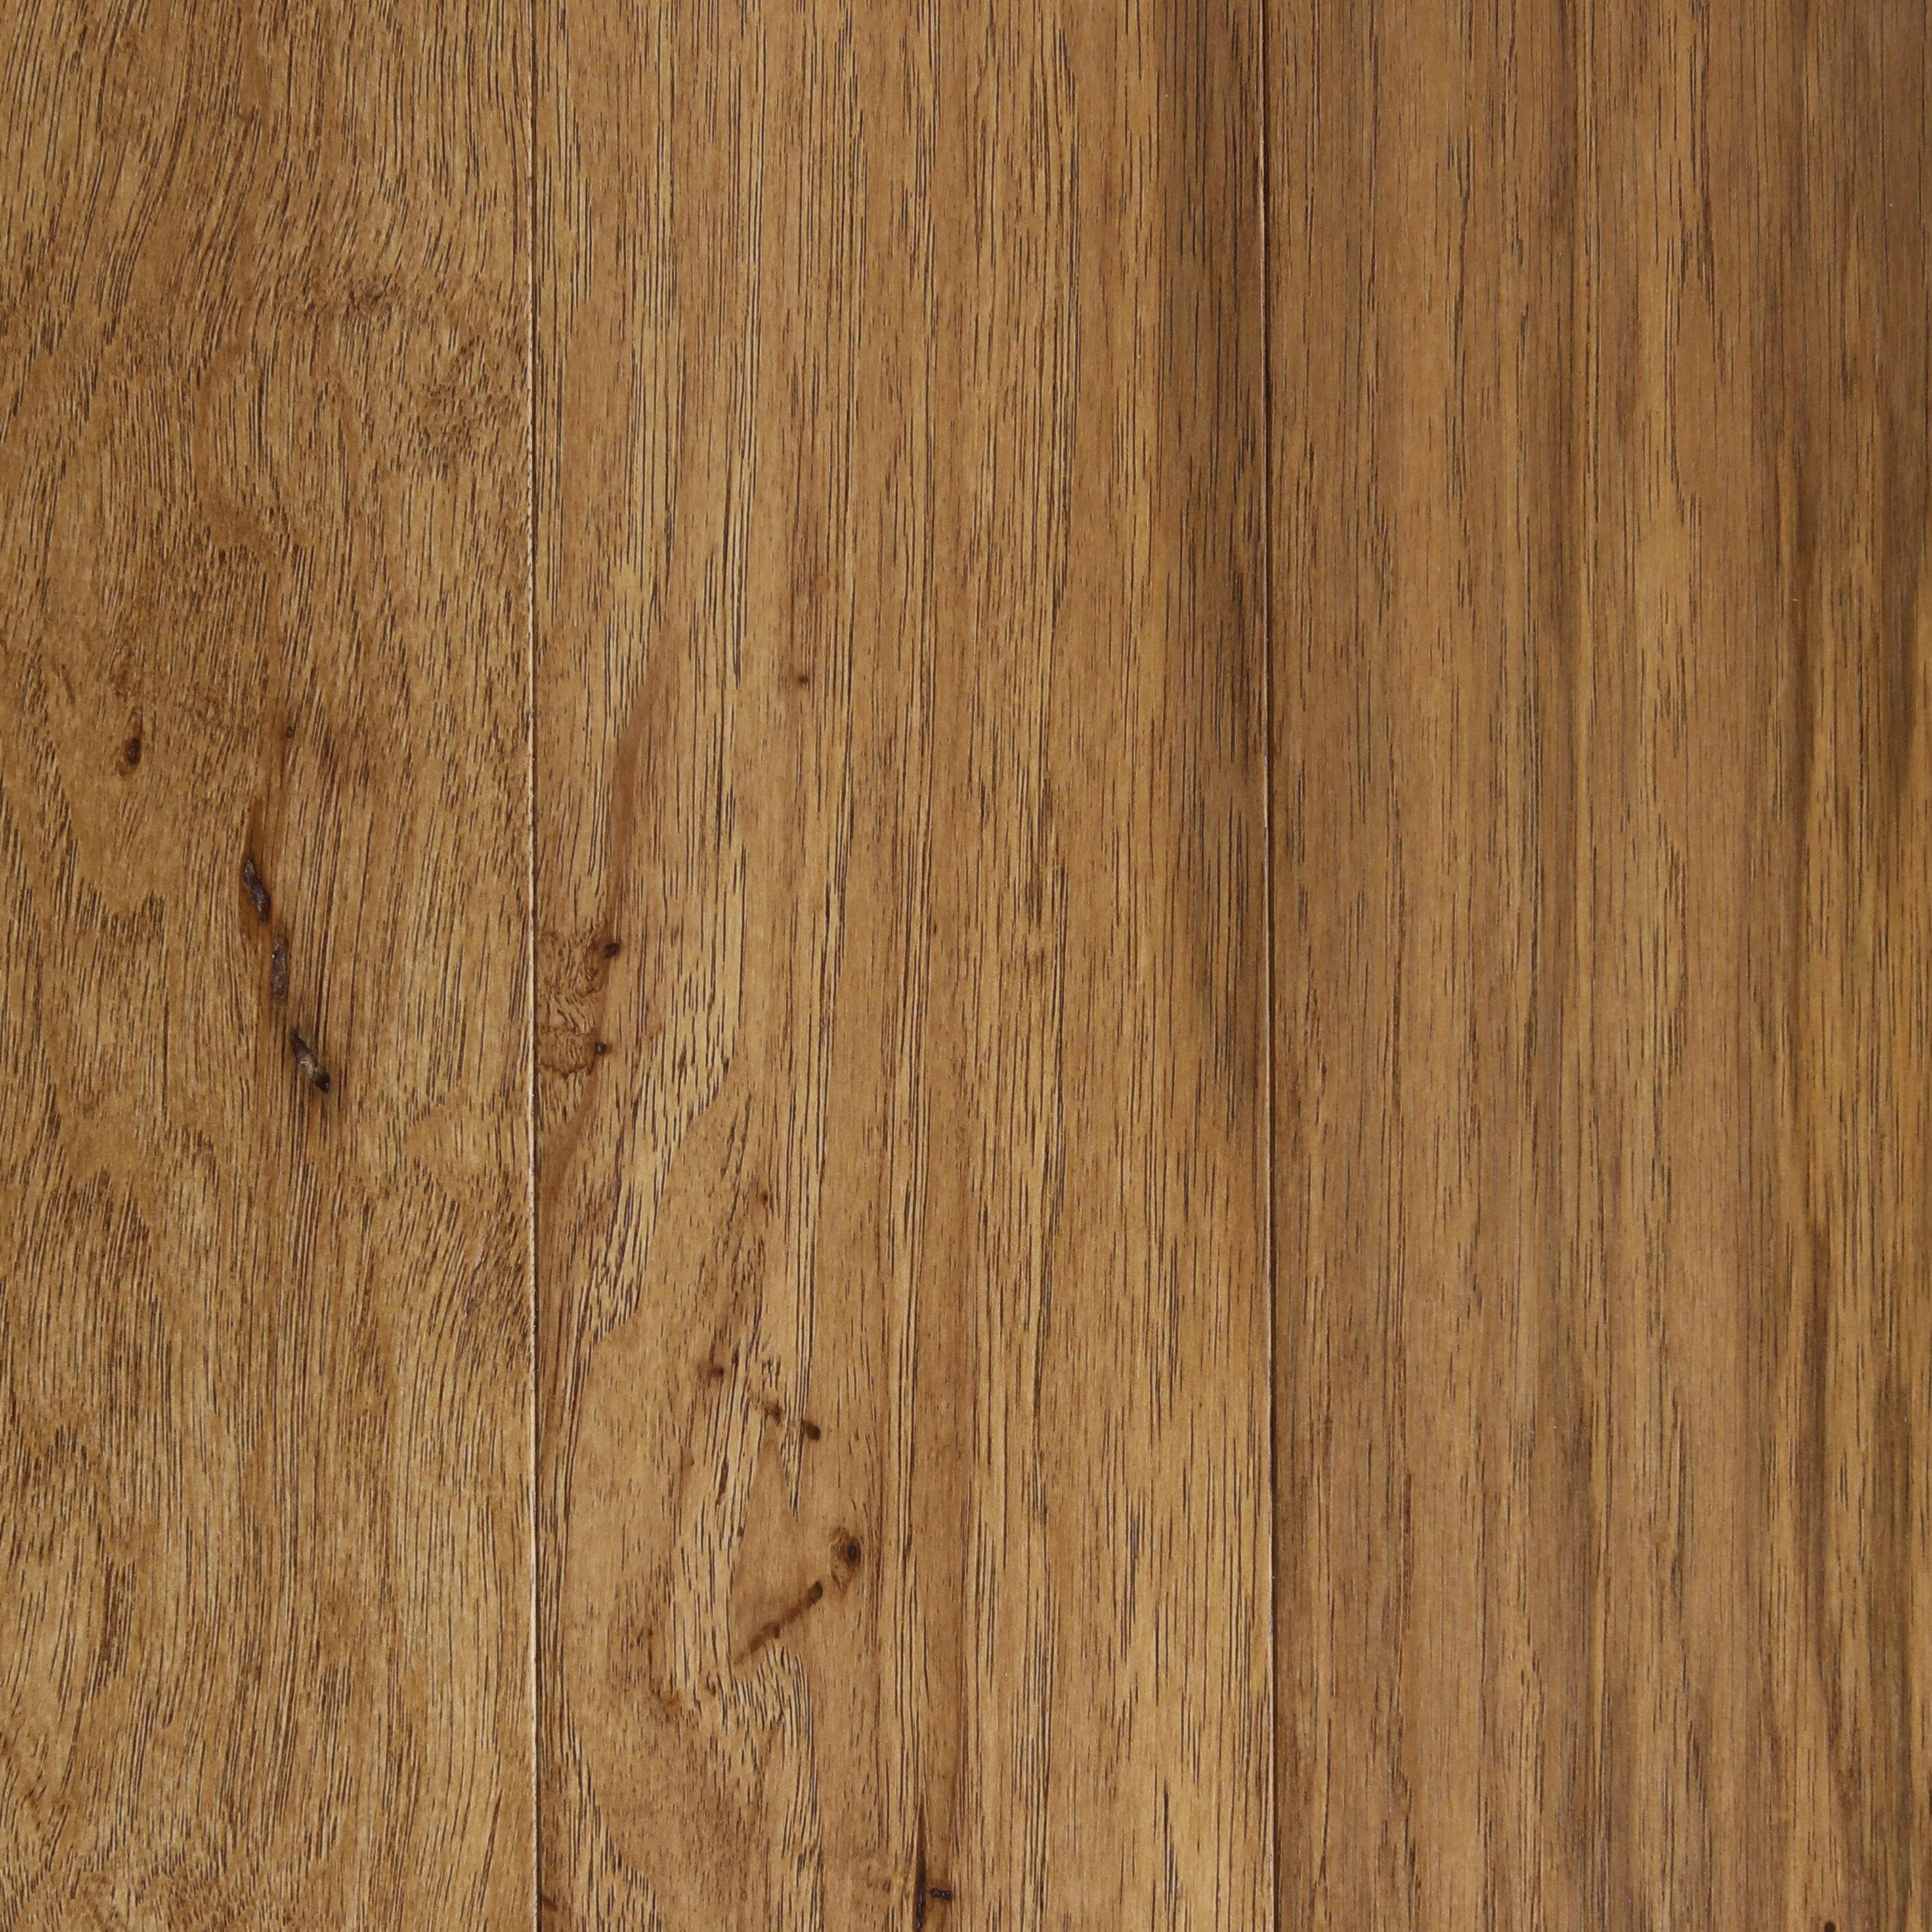 Prague Hickory 3 8 Thick X 5 Wide X Varying Length Engineered Hardwood Flooring